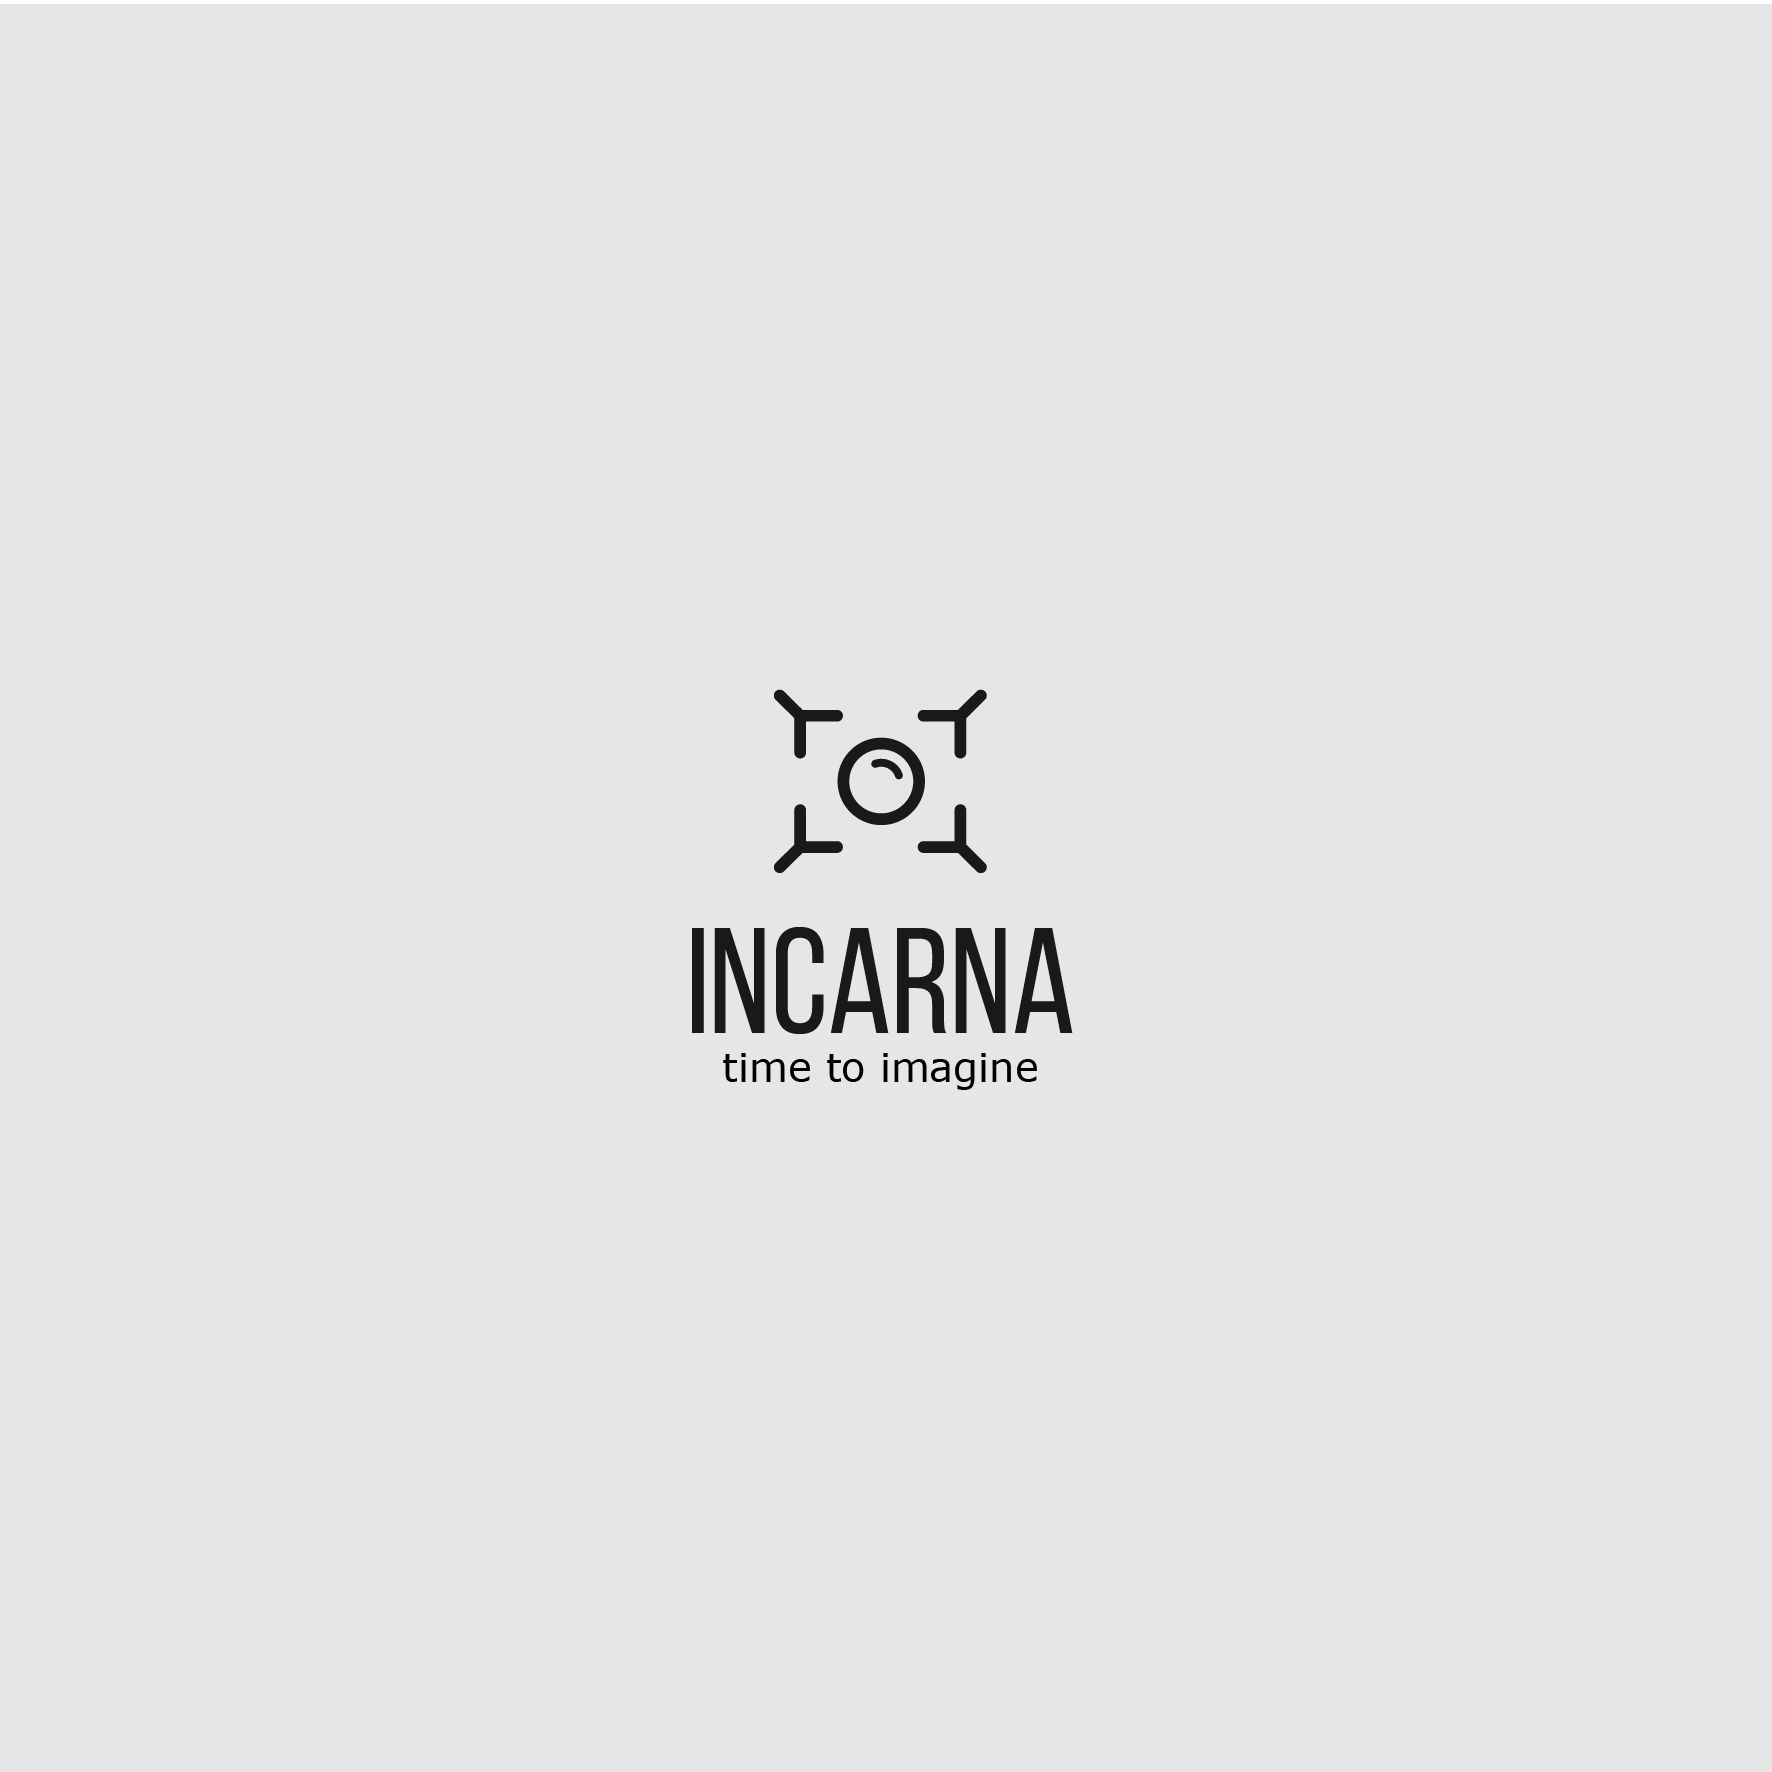 Логотип для Incarna - дизайнер andrich28